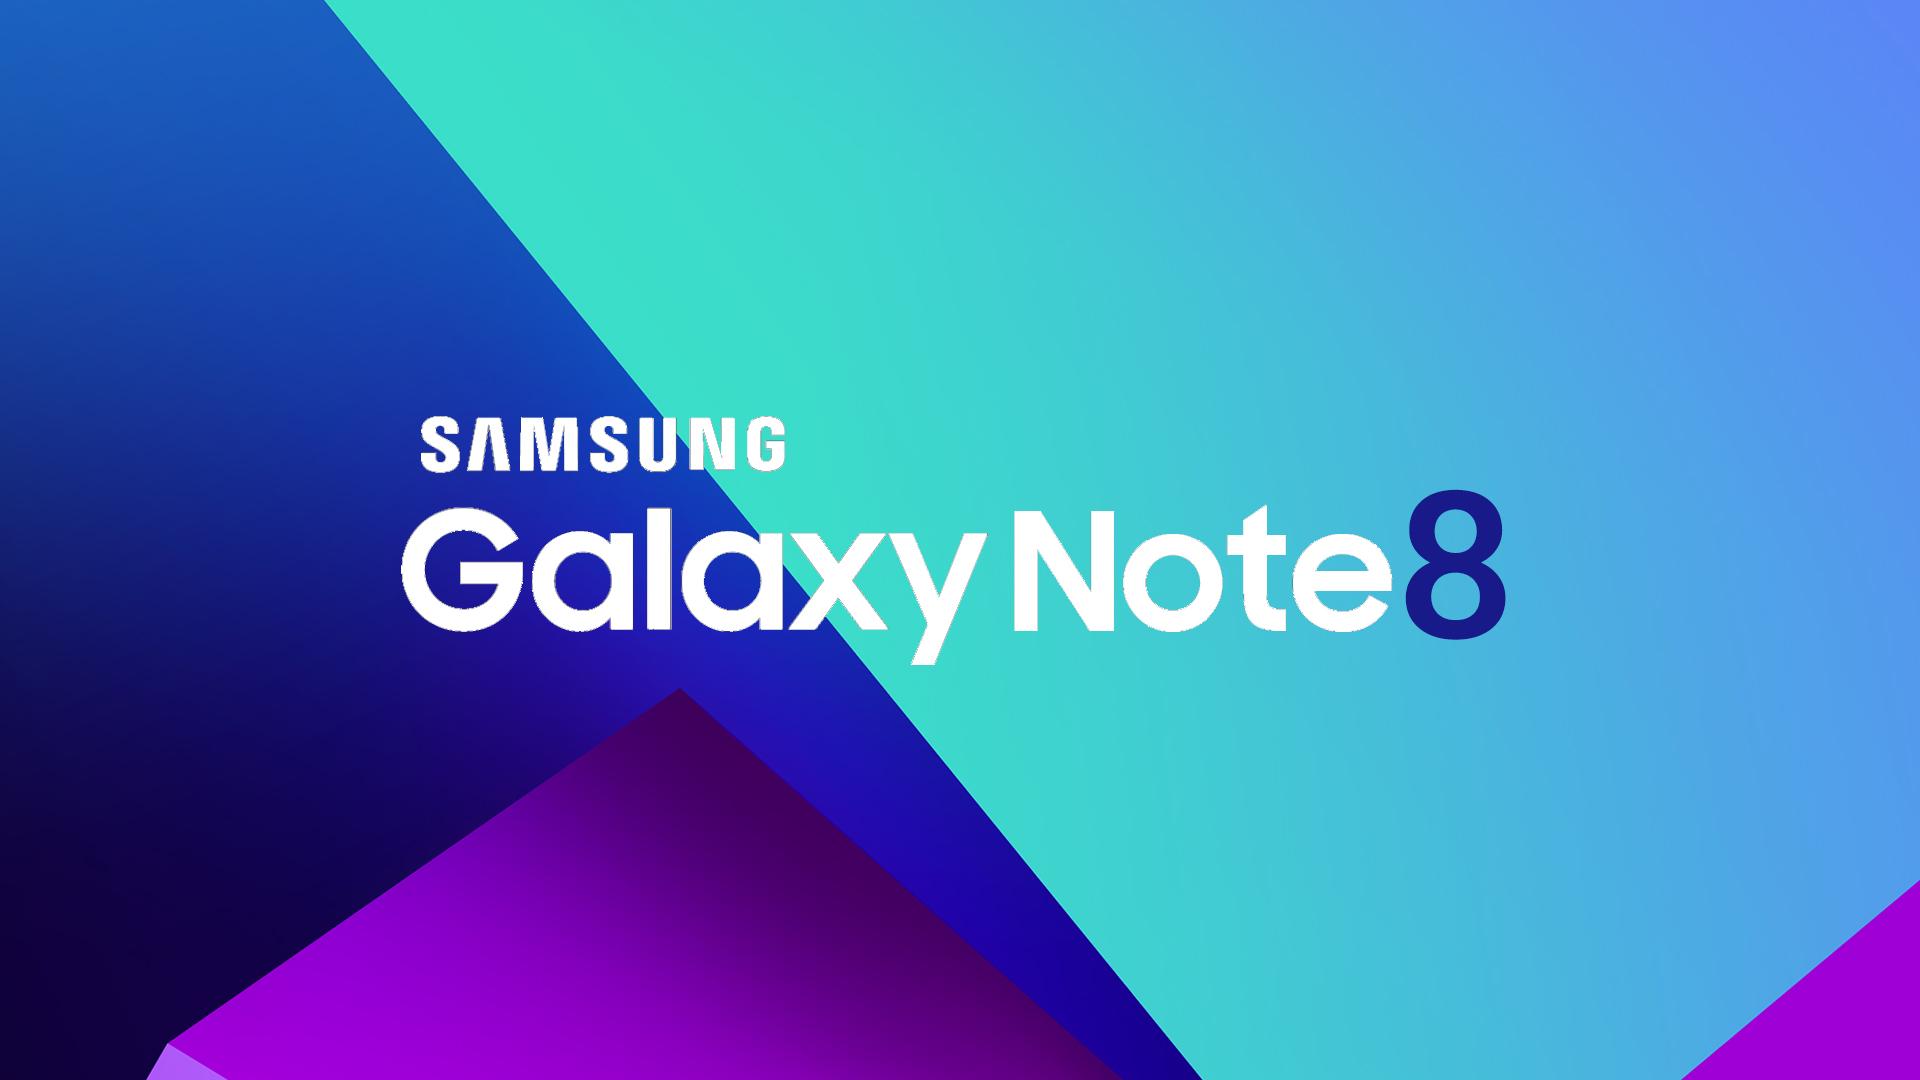 Samsung-Galaxy-Note-8-logo